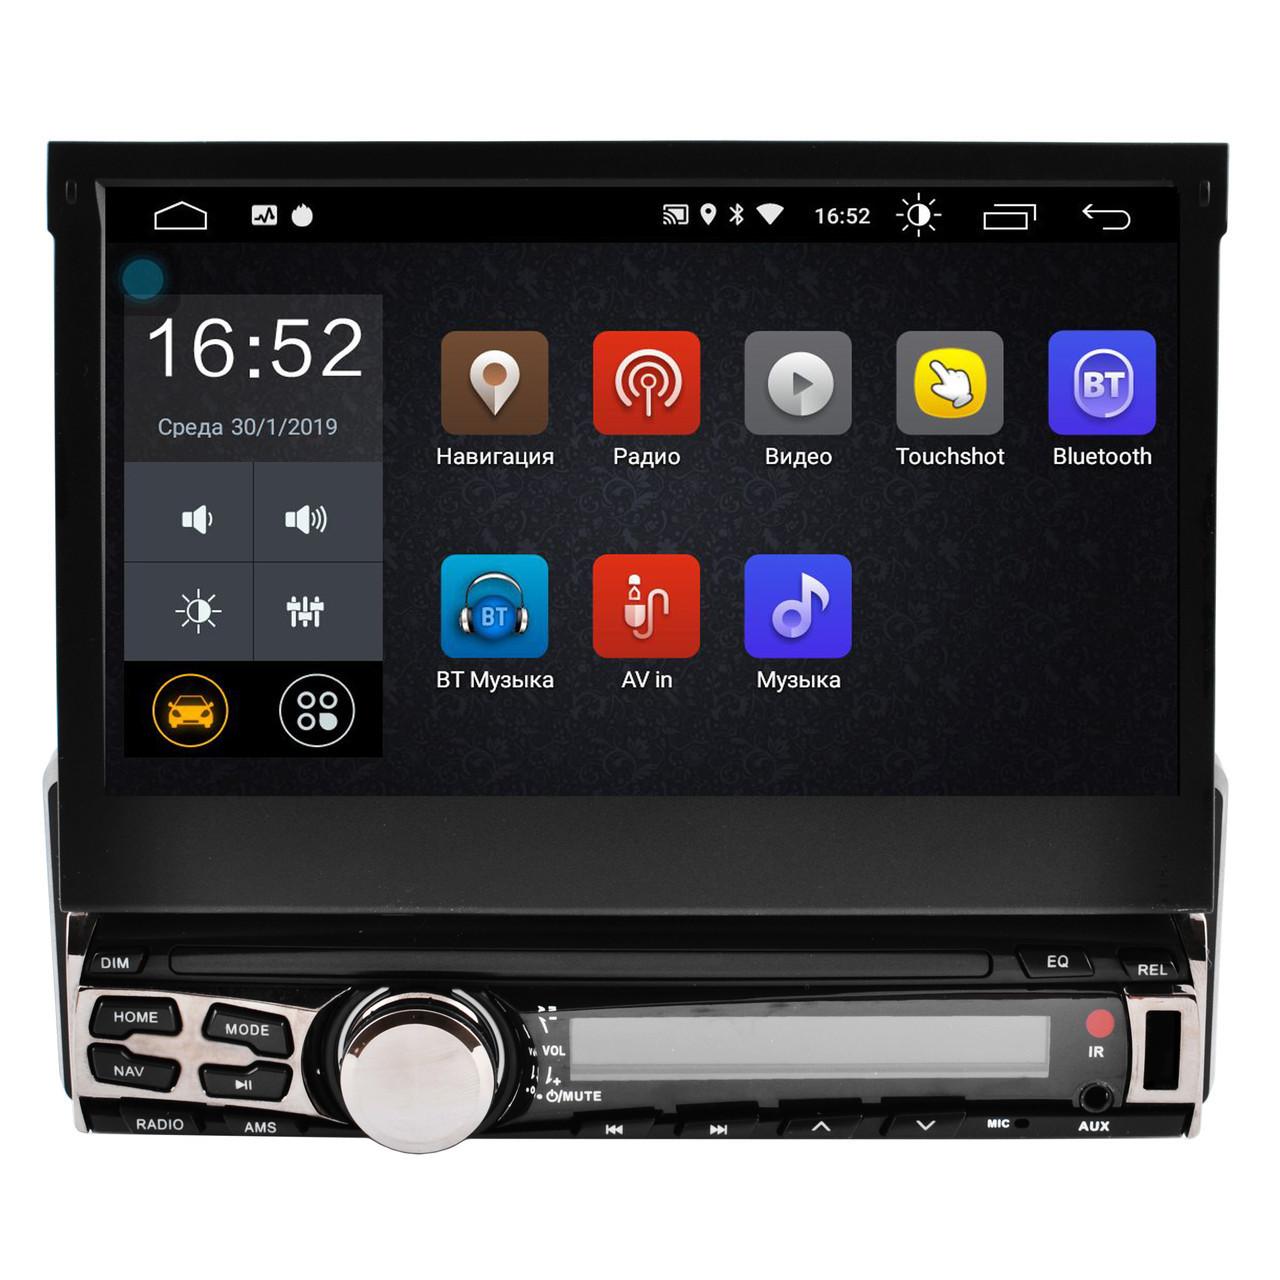 Автомагнитола Terra GB-705А на ОС Android, WiFi, GPS